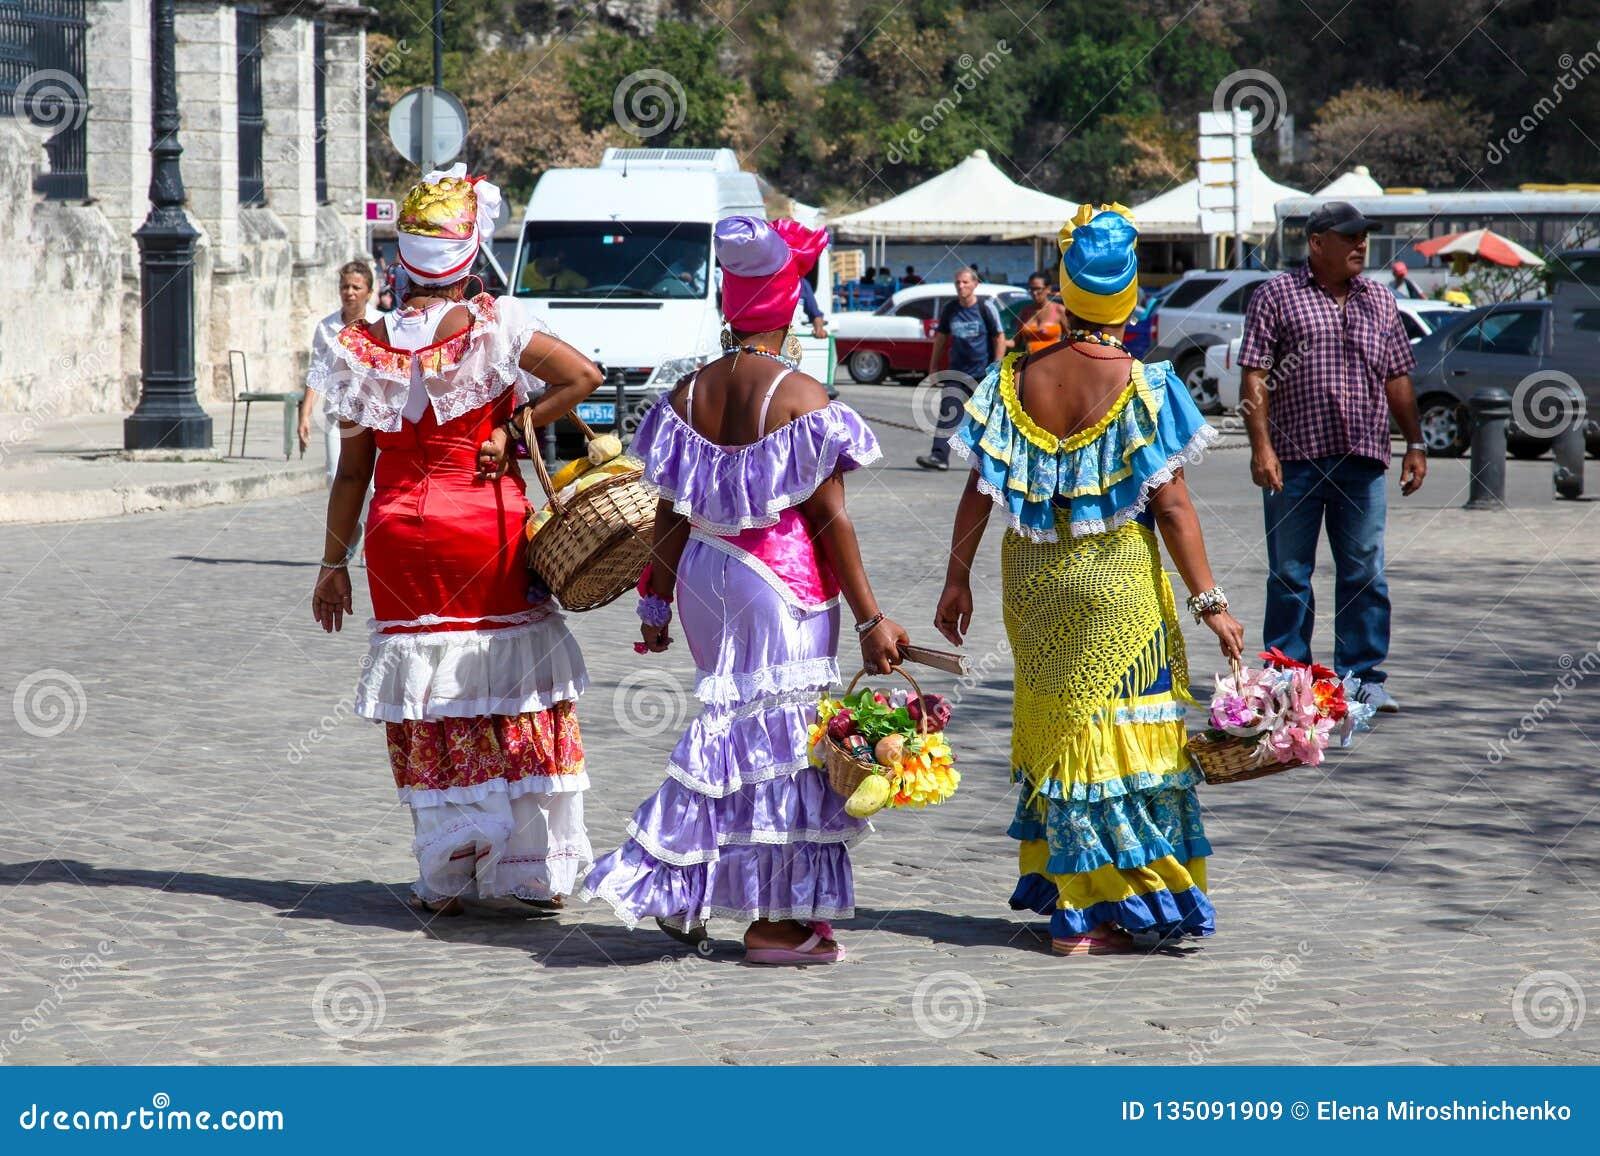 Havana/Kuba - Sept. 15 2018: Traditionelle bunte kubanische Kostüme getragen von Havana-Damen auf Havana-Straße, Kuba